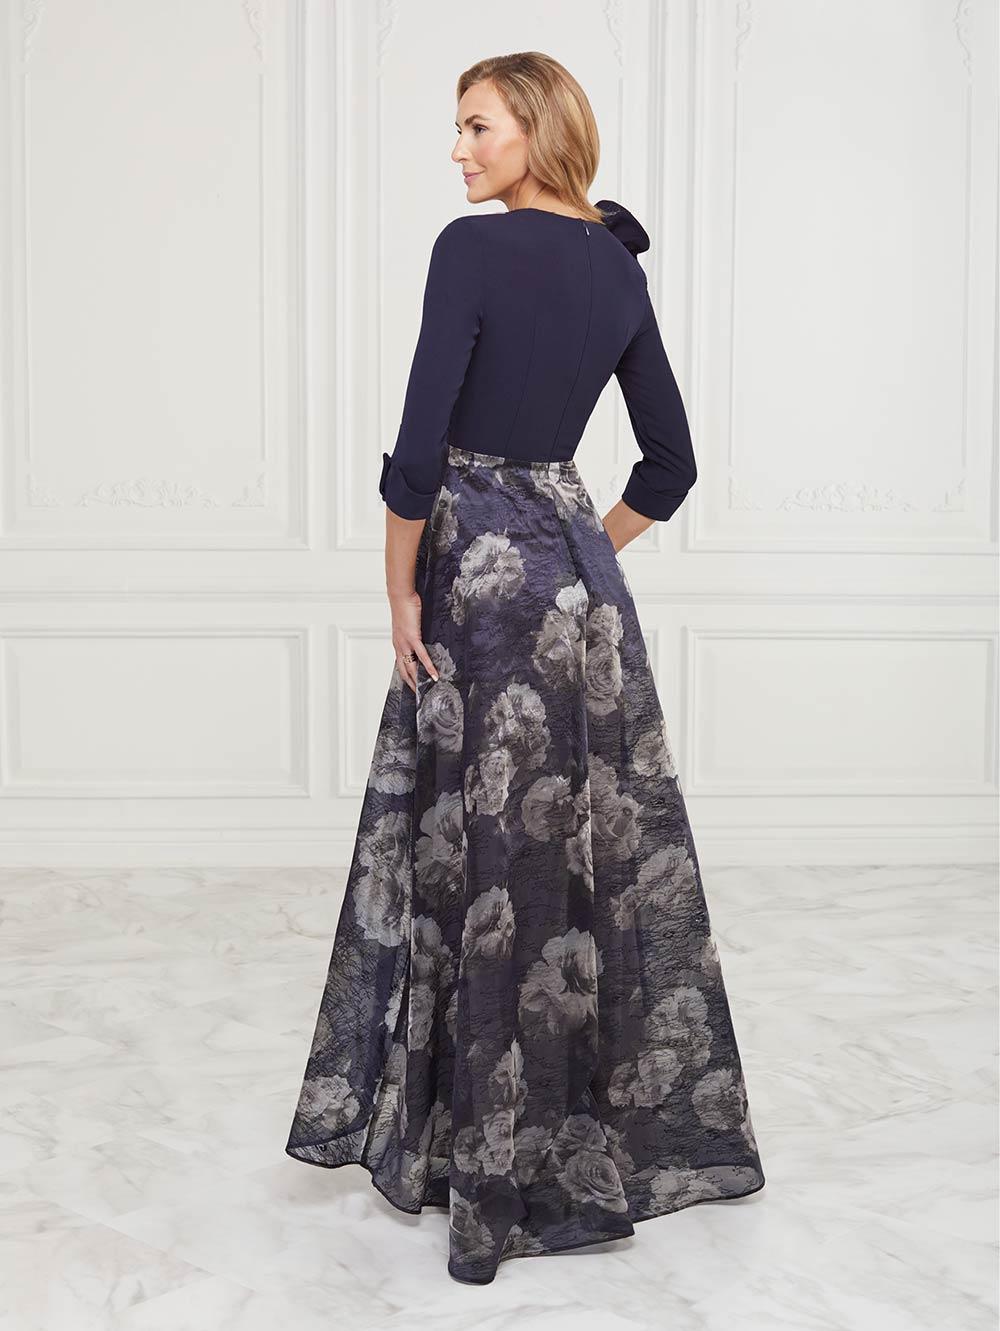 special-occasion-dresses-jacquelin-bridals-canada-27699